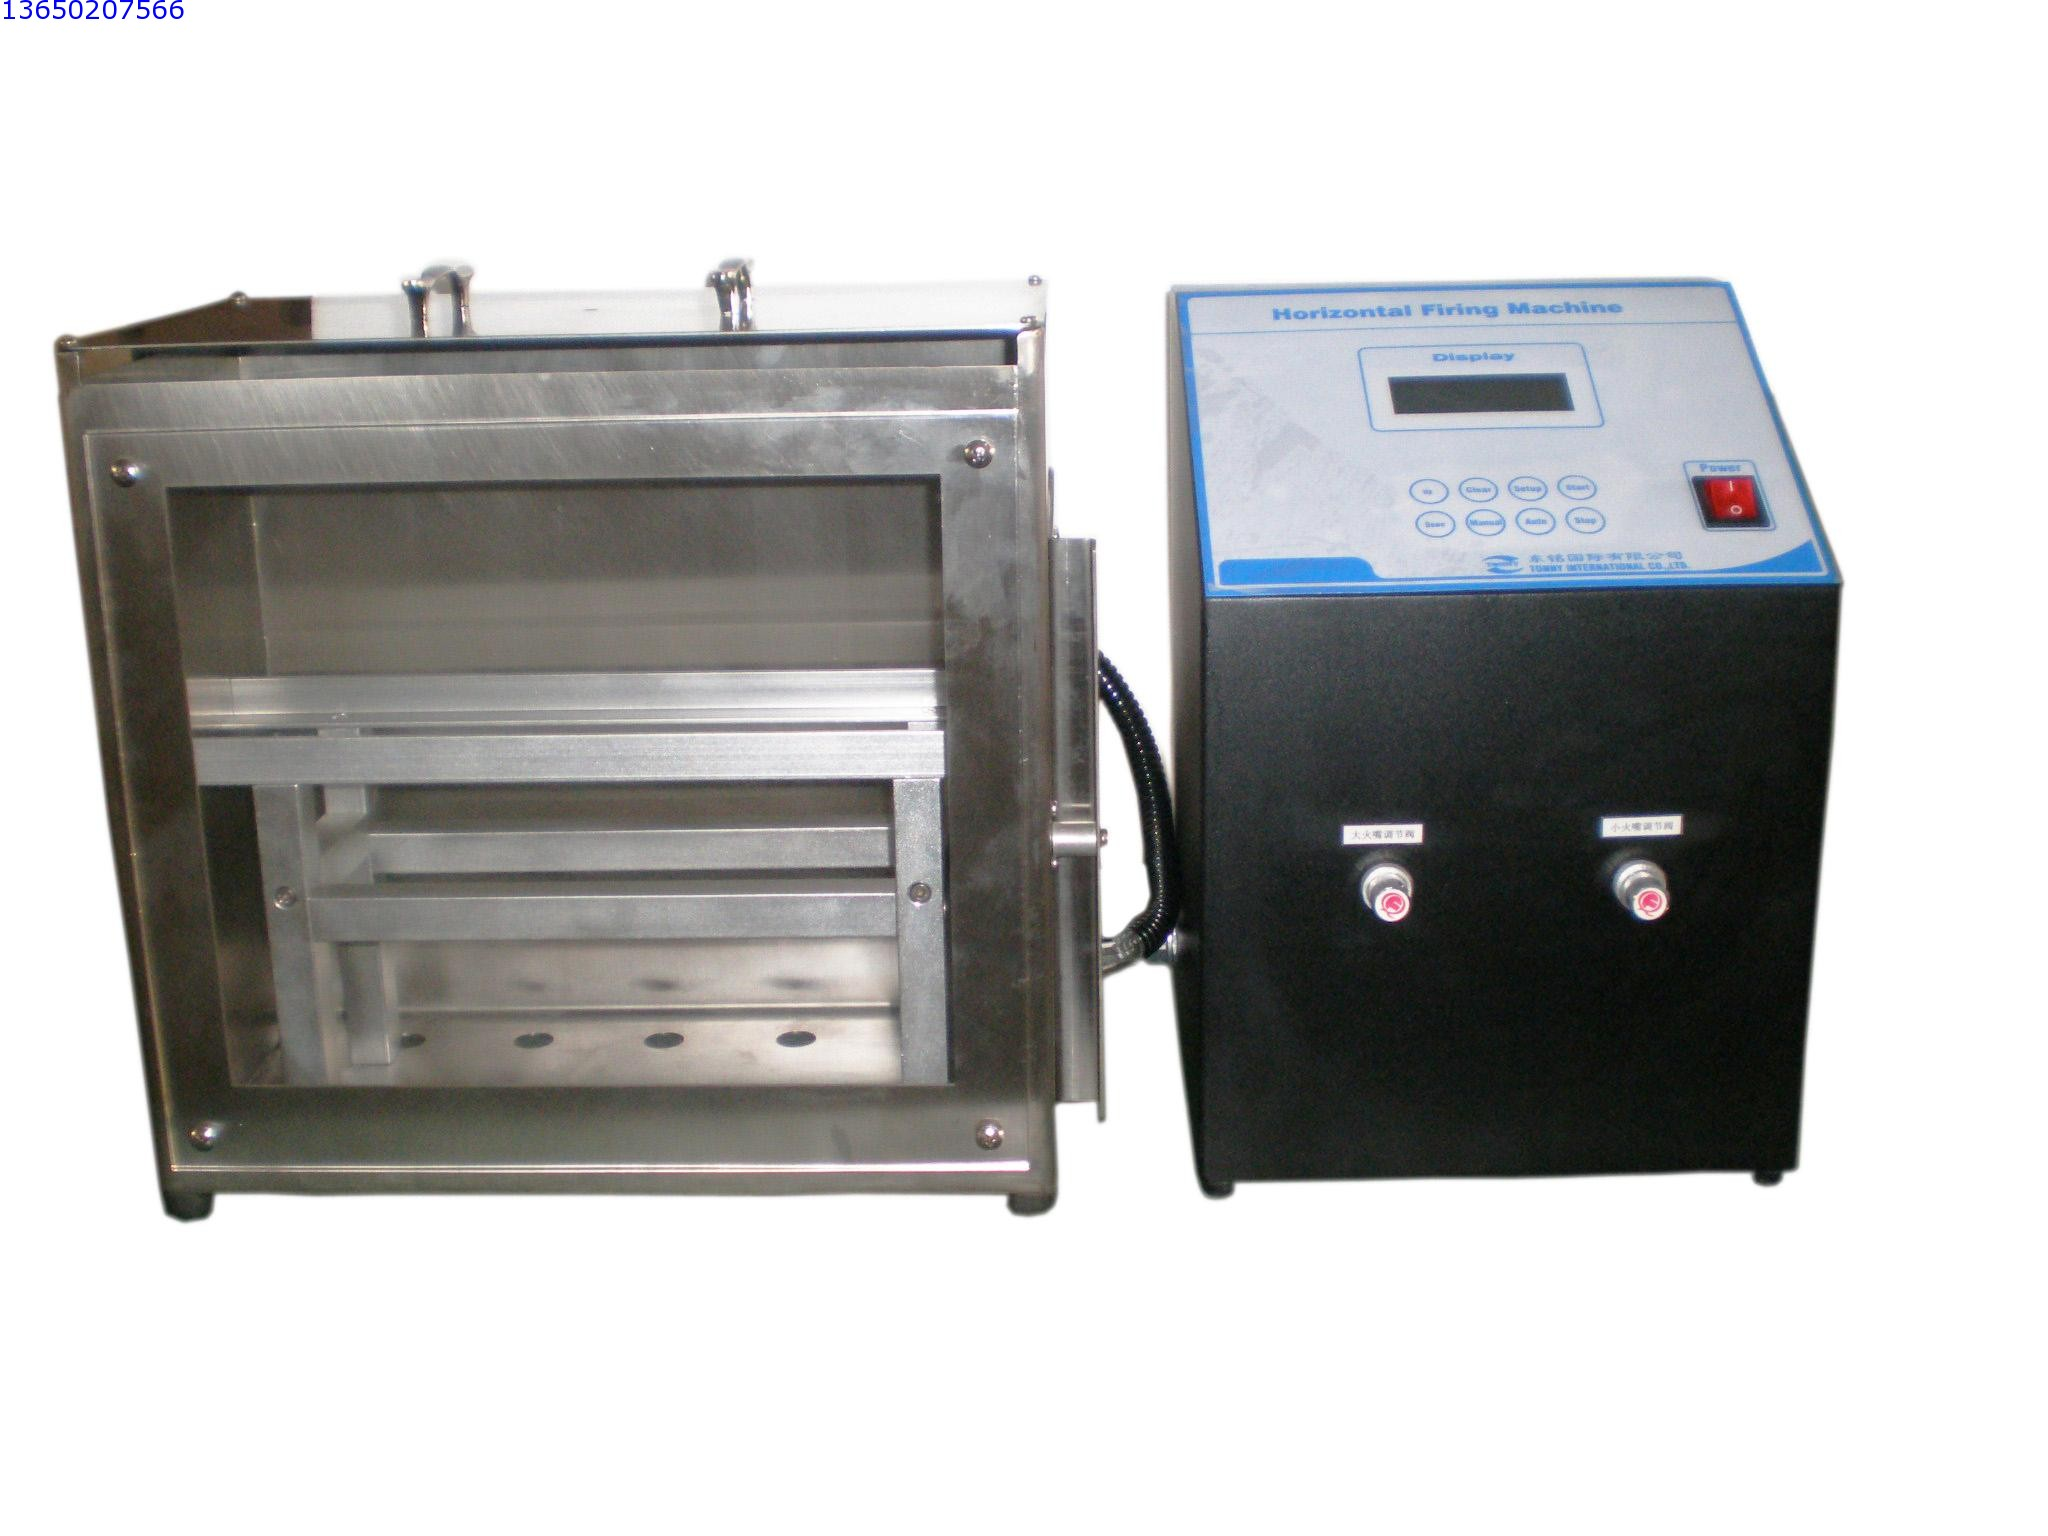 QI-S-017水平燃烧测试仪